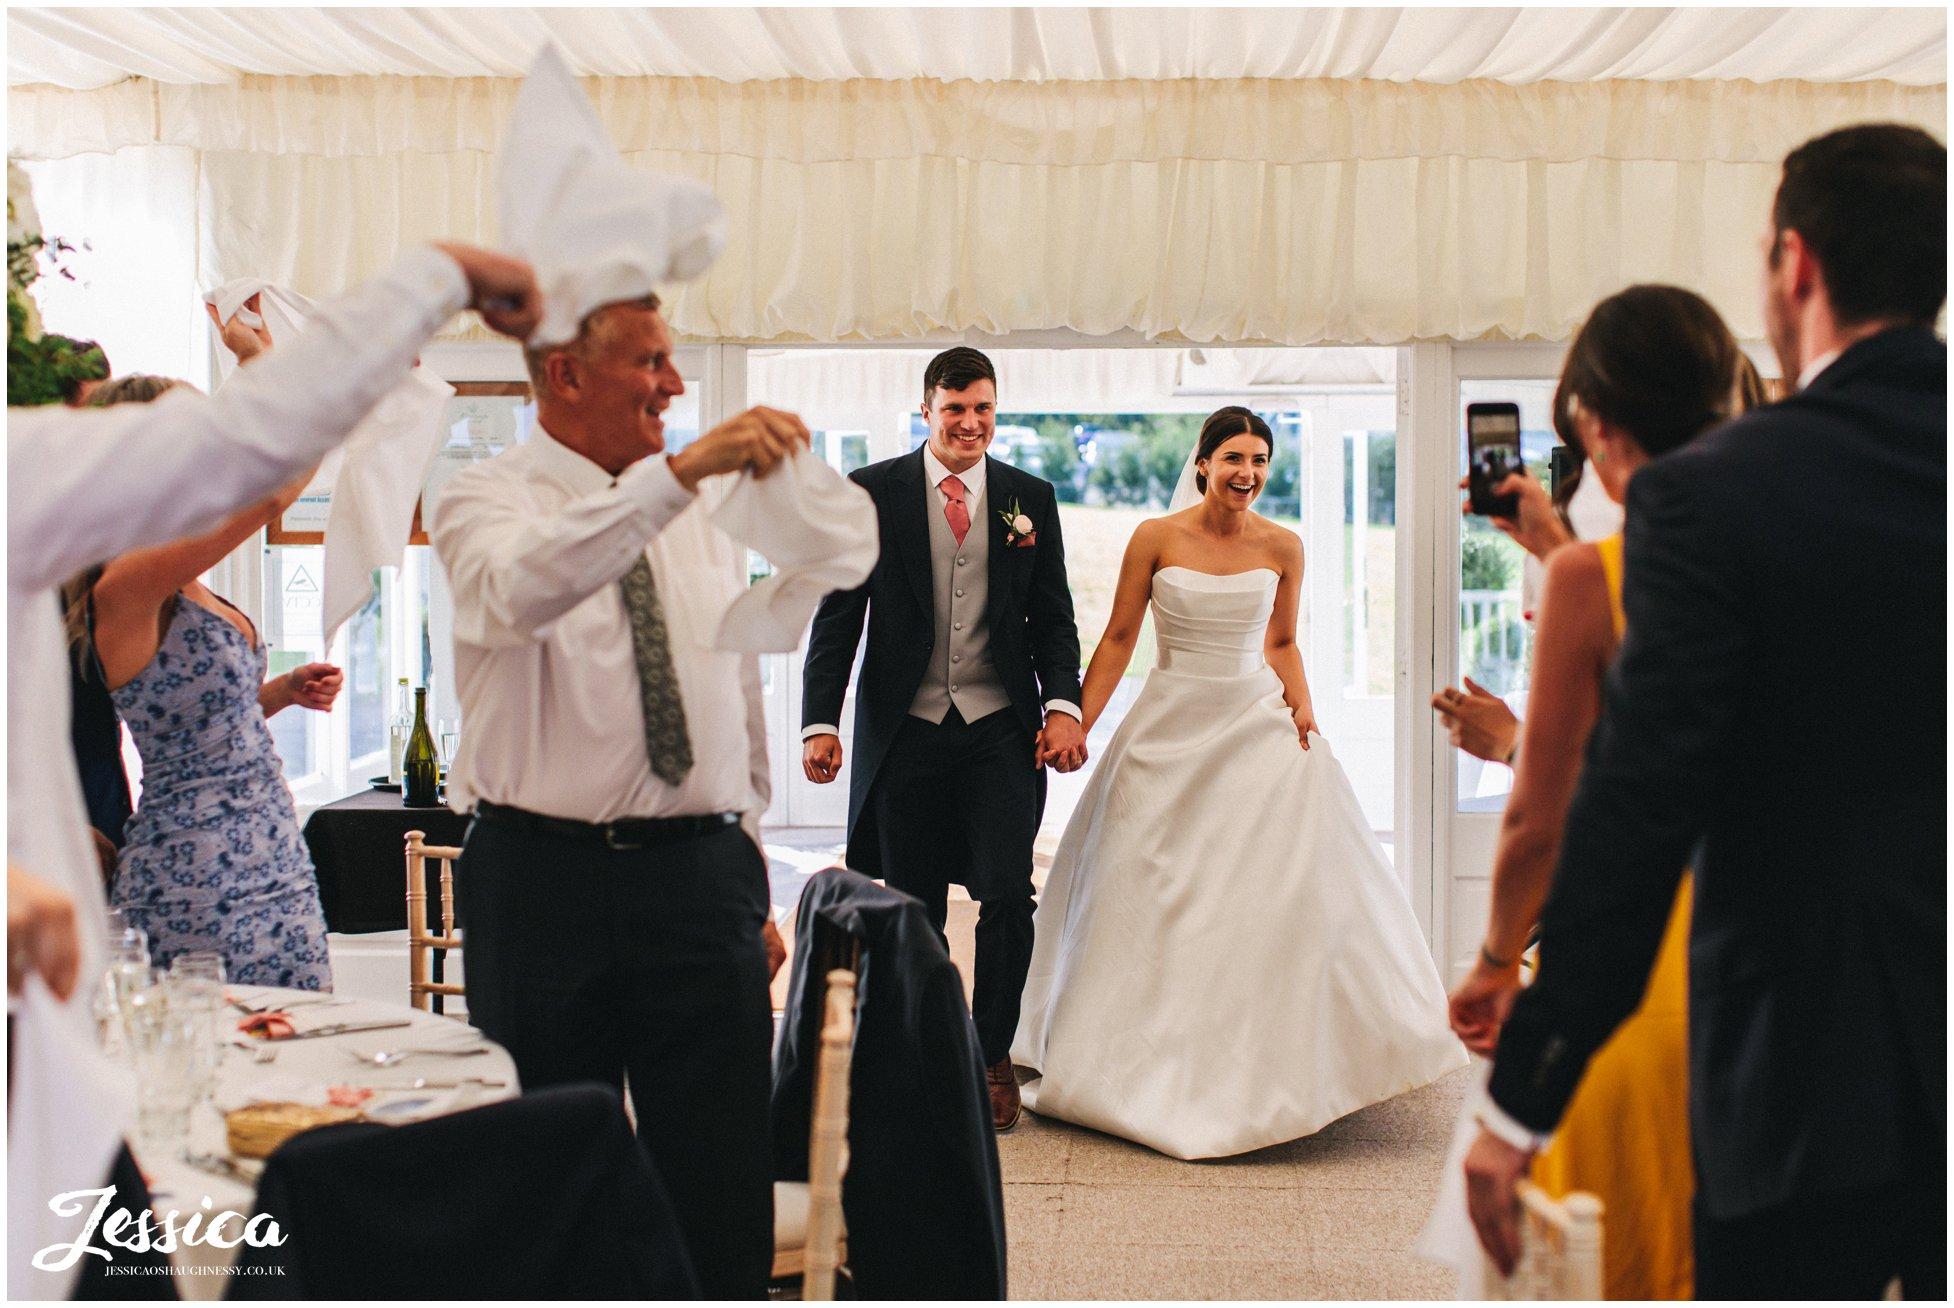 bride & groom enter room for the wedding breakfast